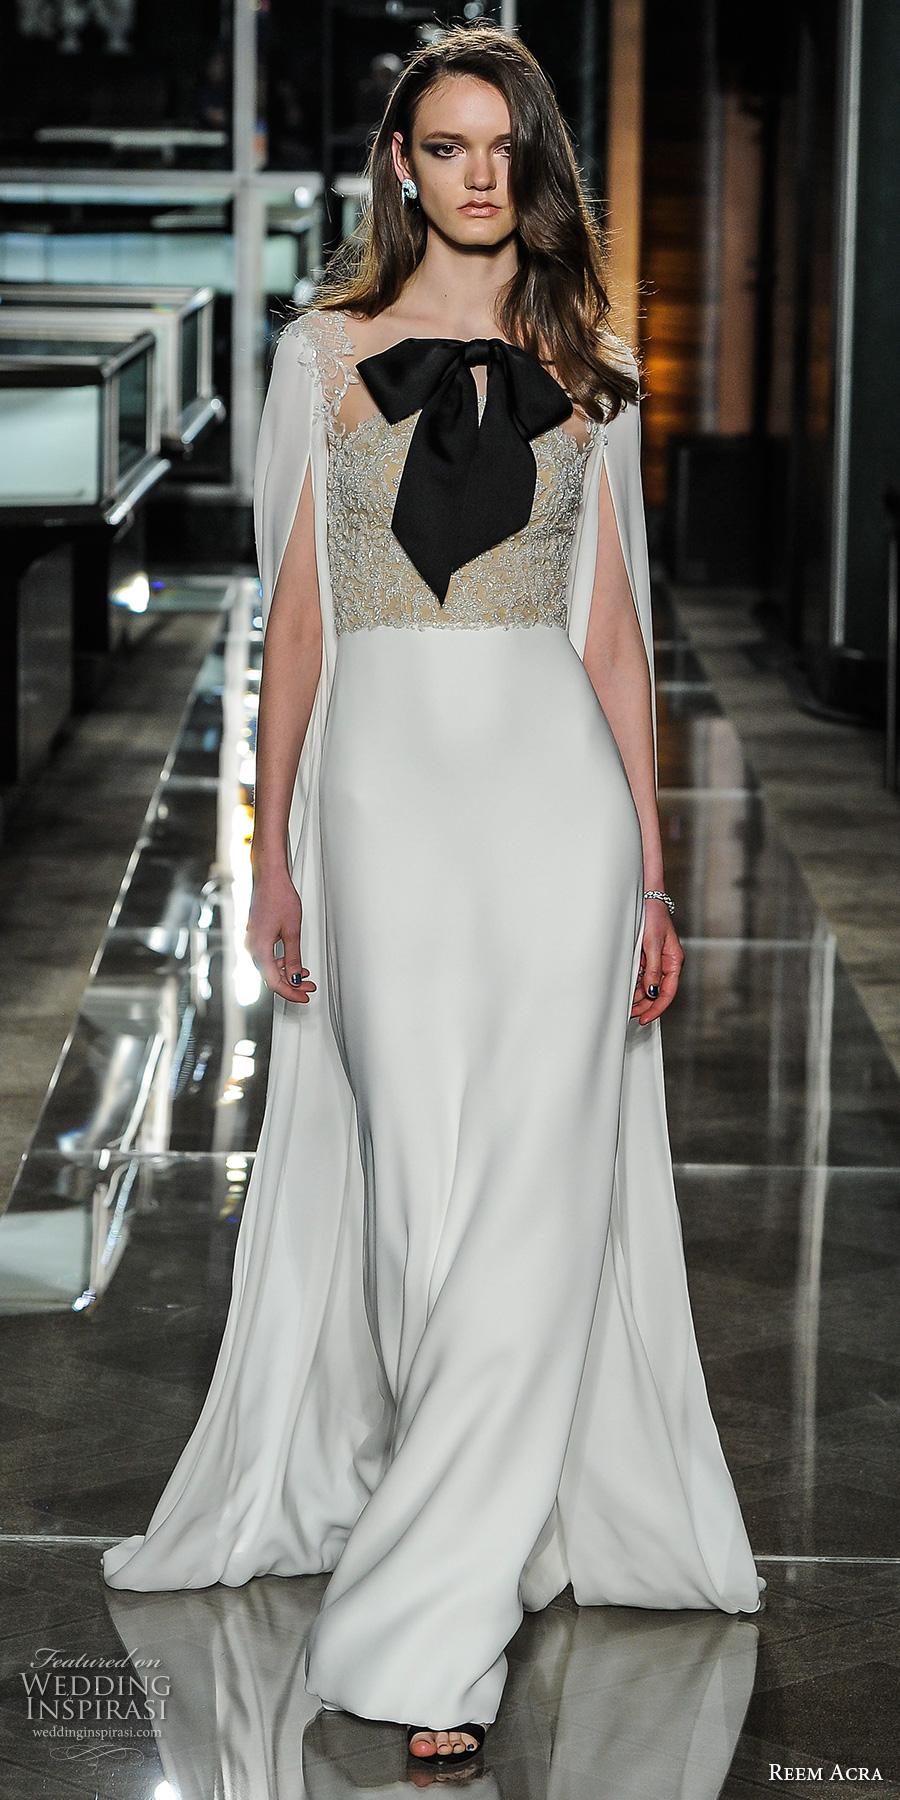 Reem Acra Wedding Gown 37 Vintage reem acra spring bridal